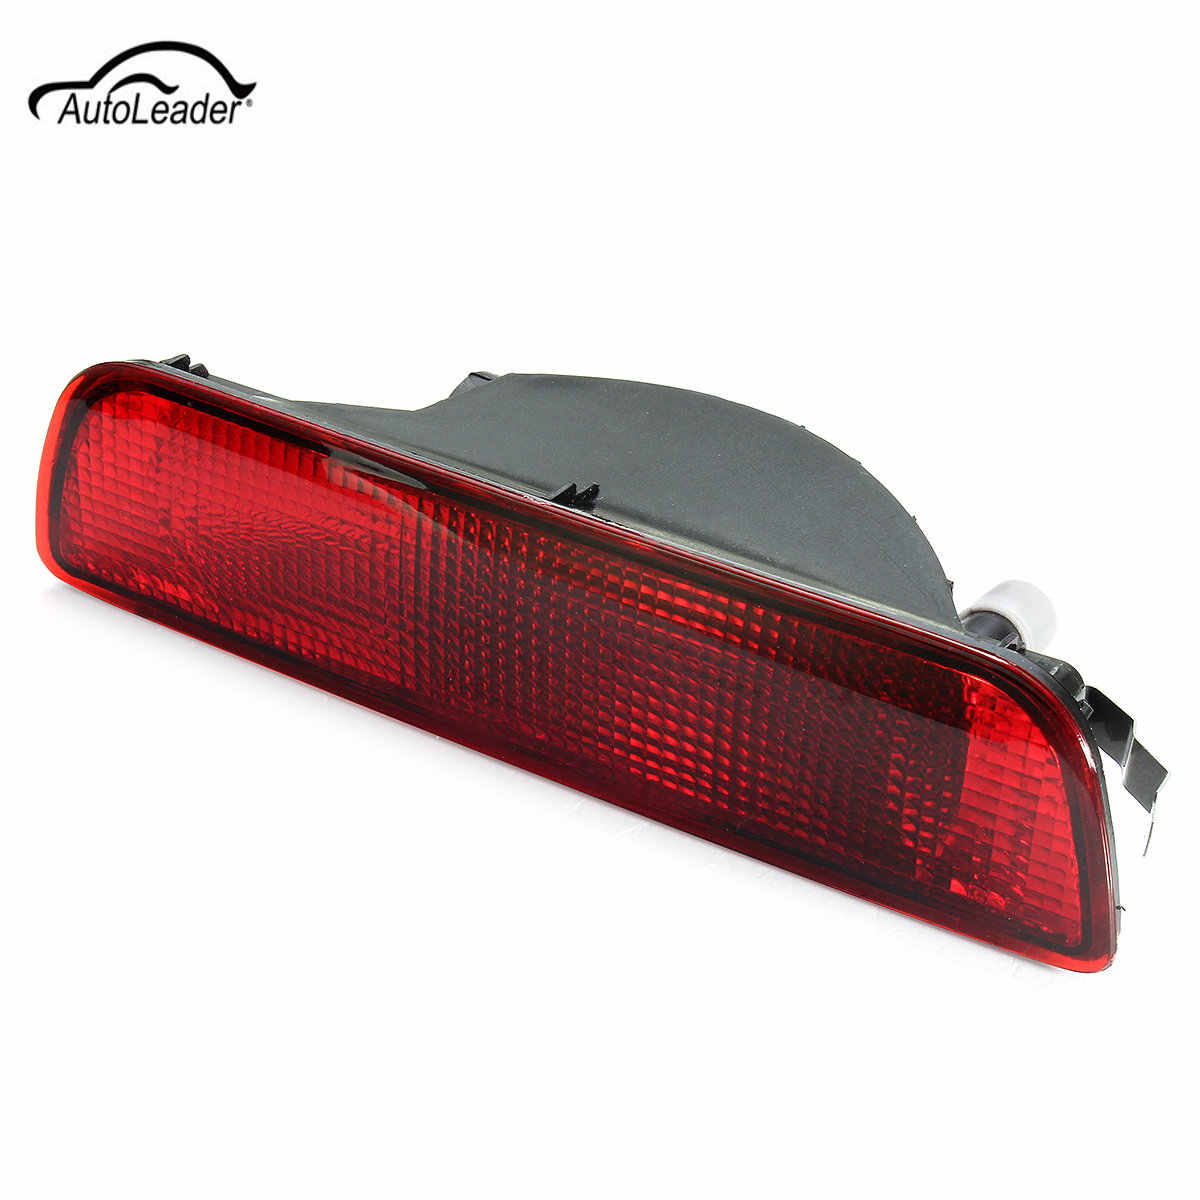 1Pc Universal Car 5LED Warning 12V Rear High Mount 3RD Brake Stop Tail Light mkl